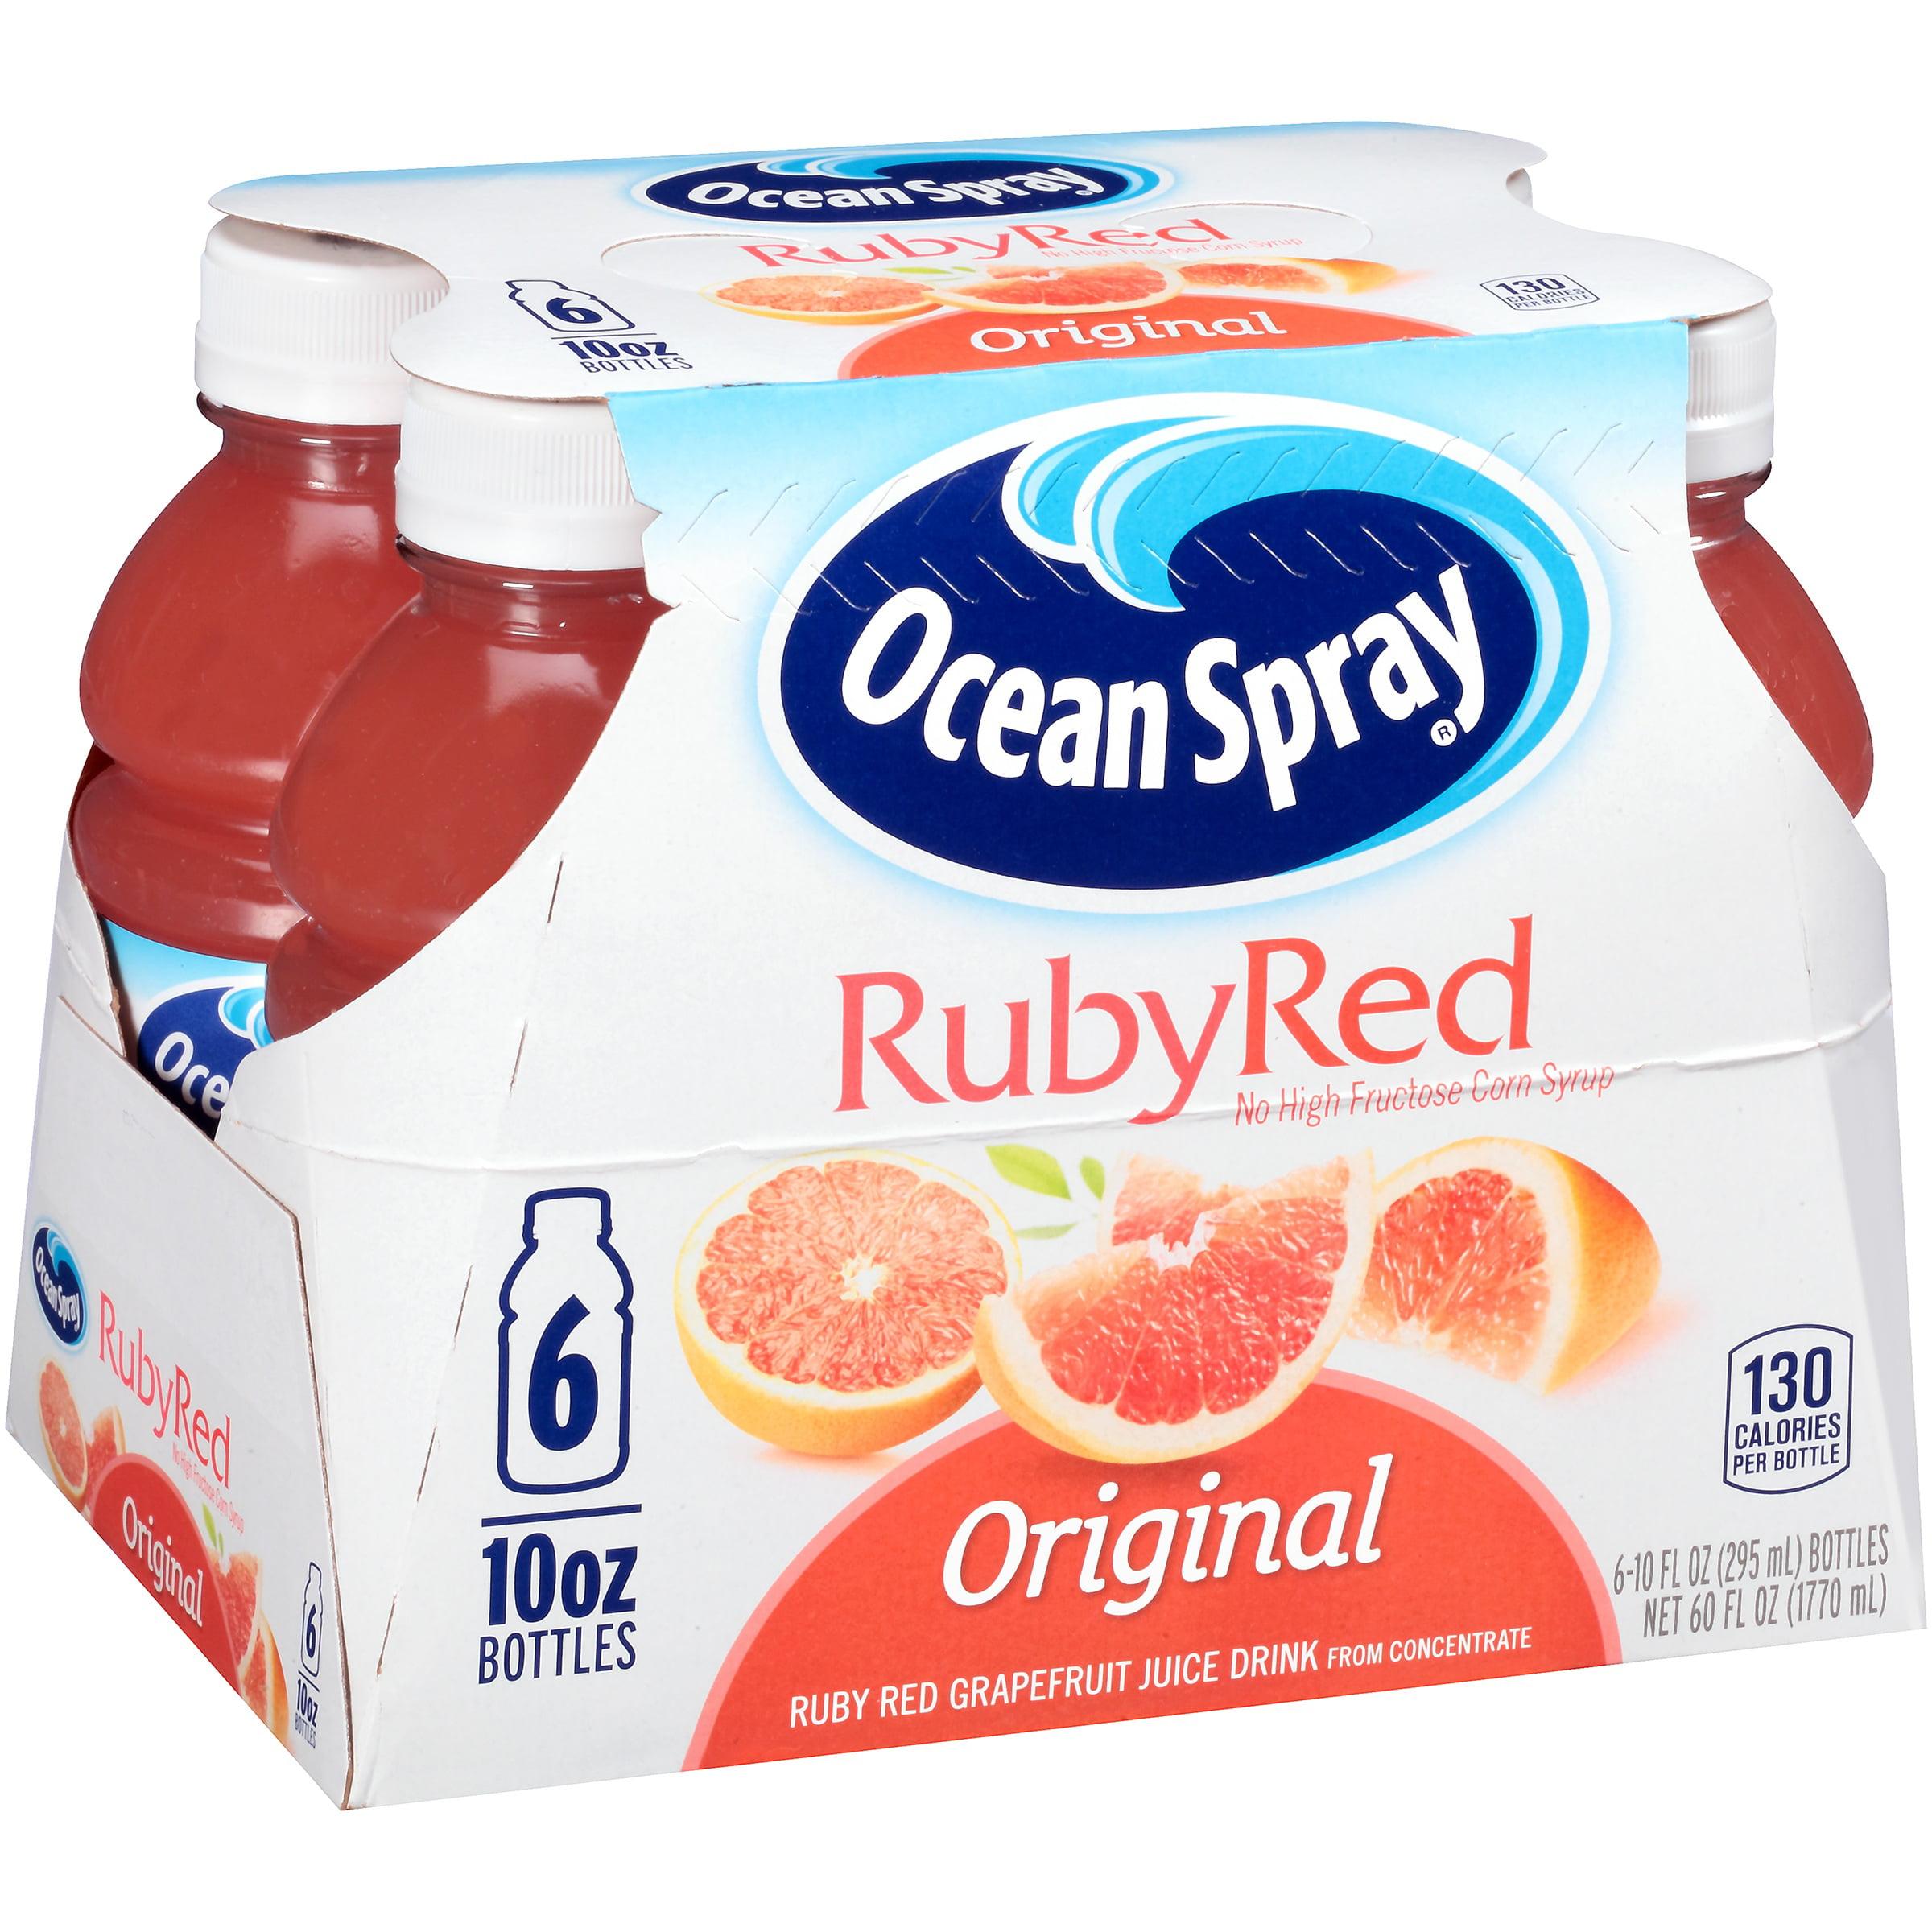 Ocean Spray Original Ruby Red Grapefruit Juice Drink, 10 fl oz, 6 count